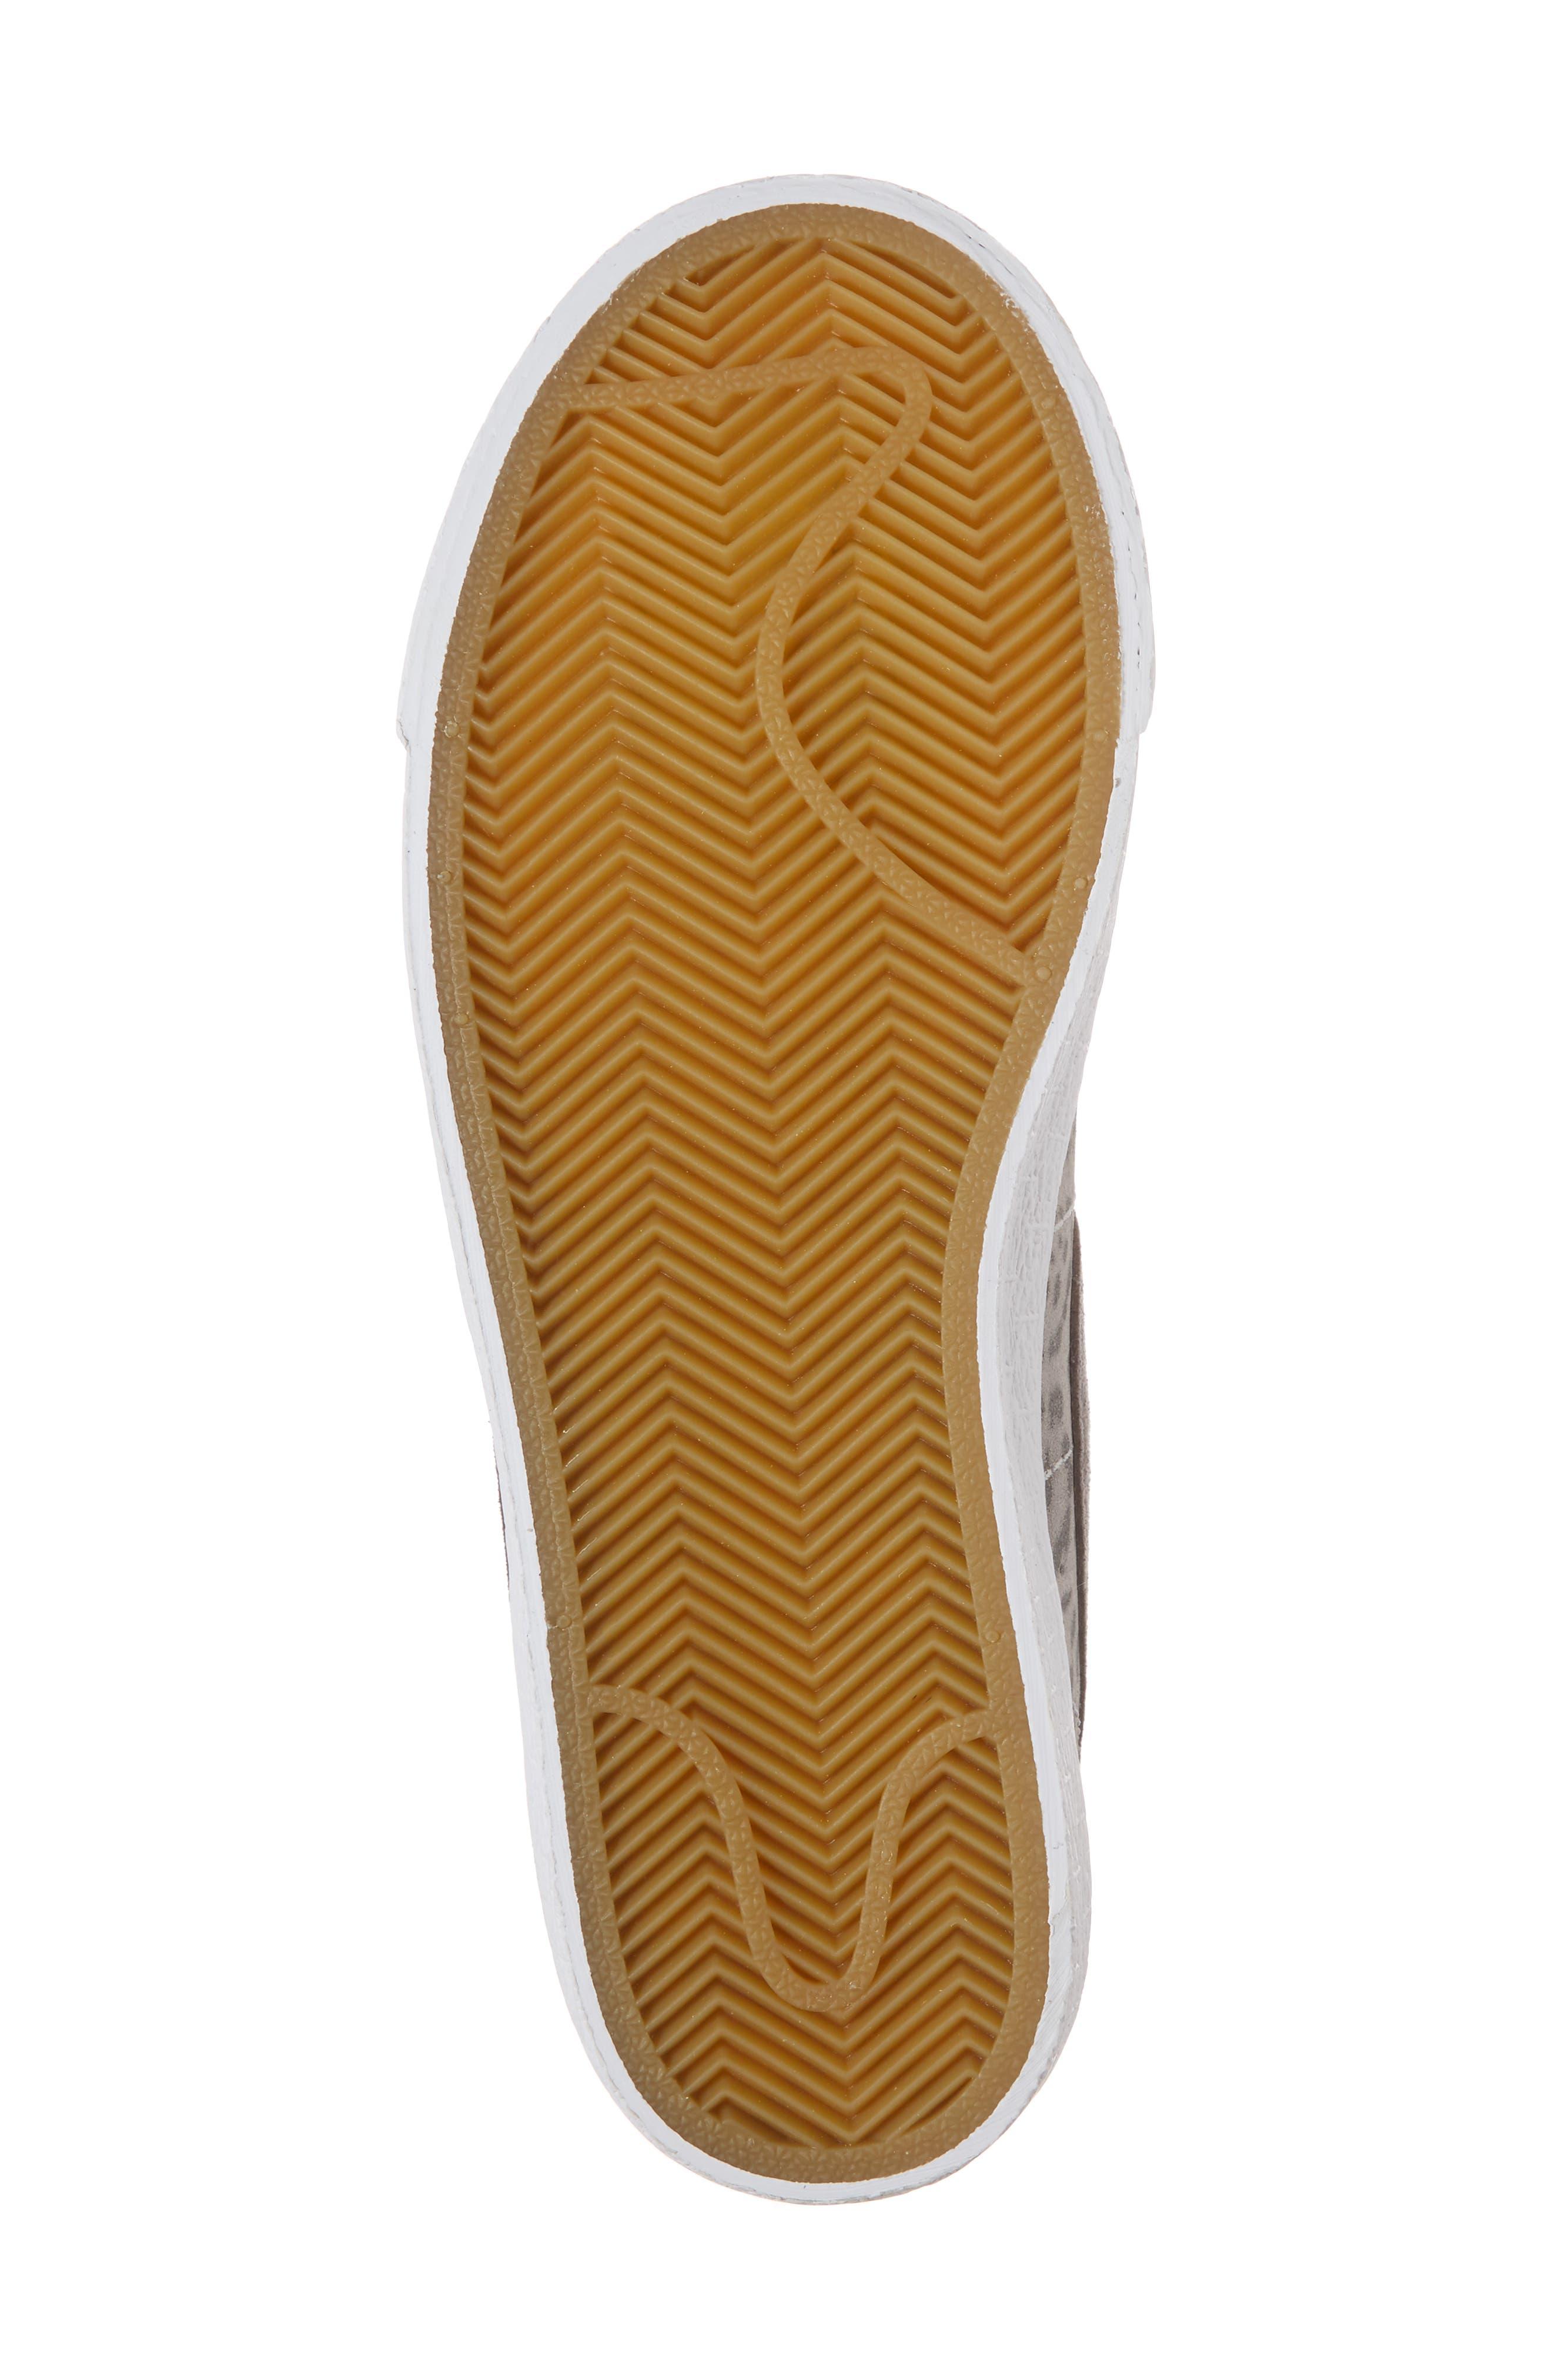 Blazer Mid SE High Top Sneaker,                             Alternate thumbnail 16, color,